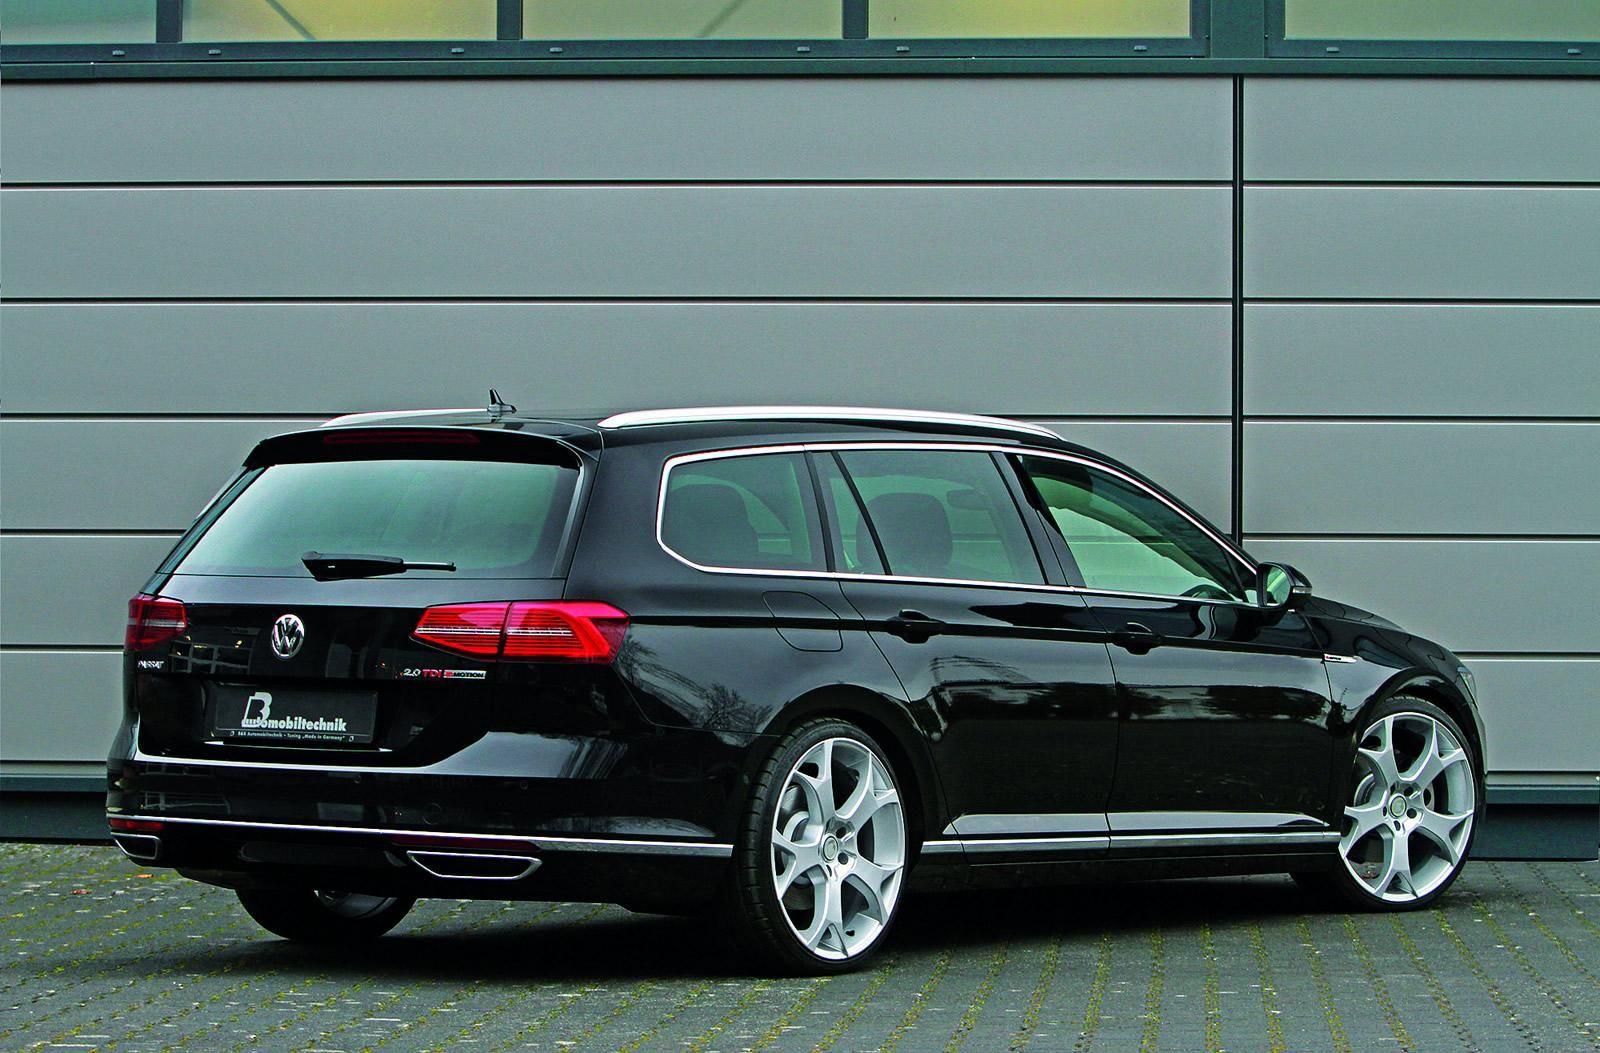 2015 Volkswagen Passat Variant by B&B | Cars | Pinterest ...